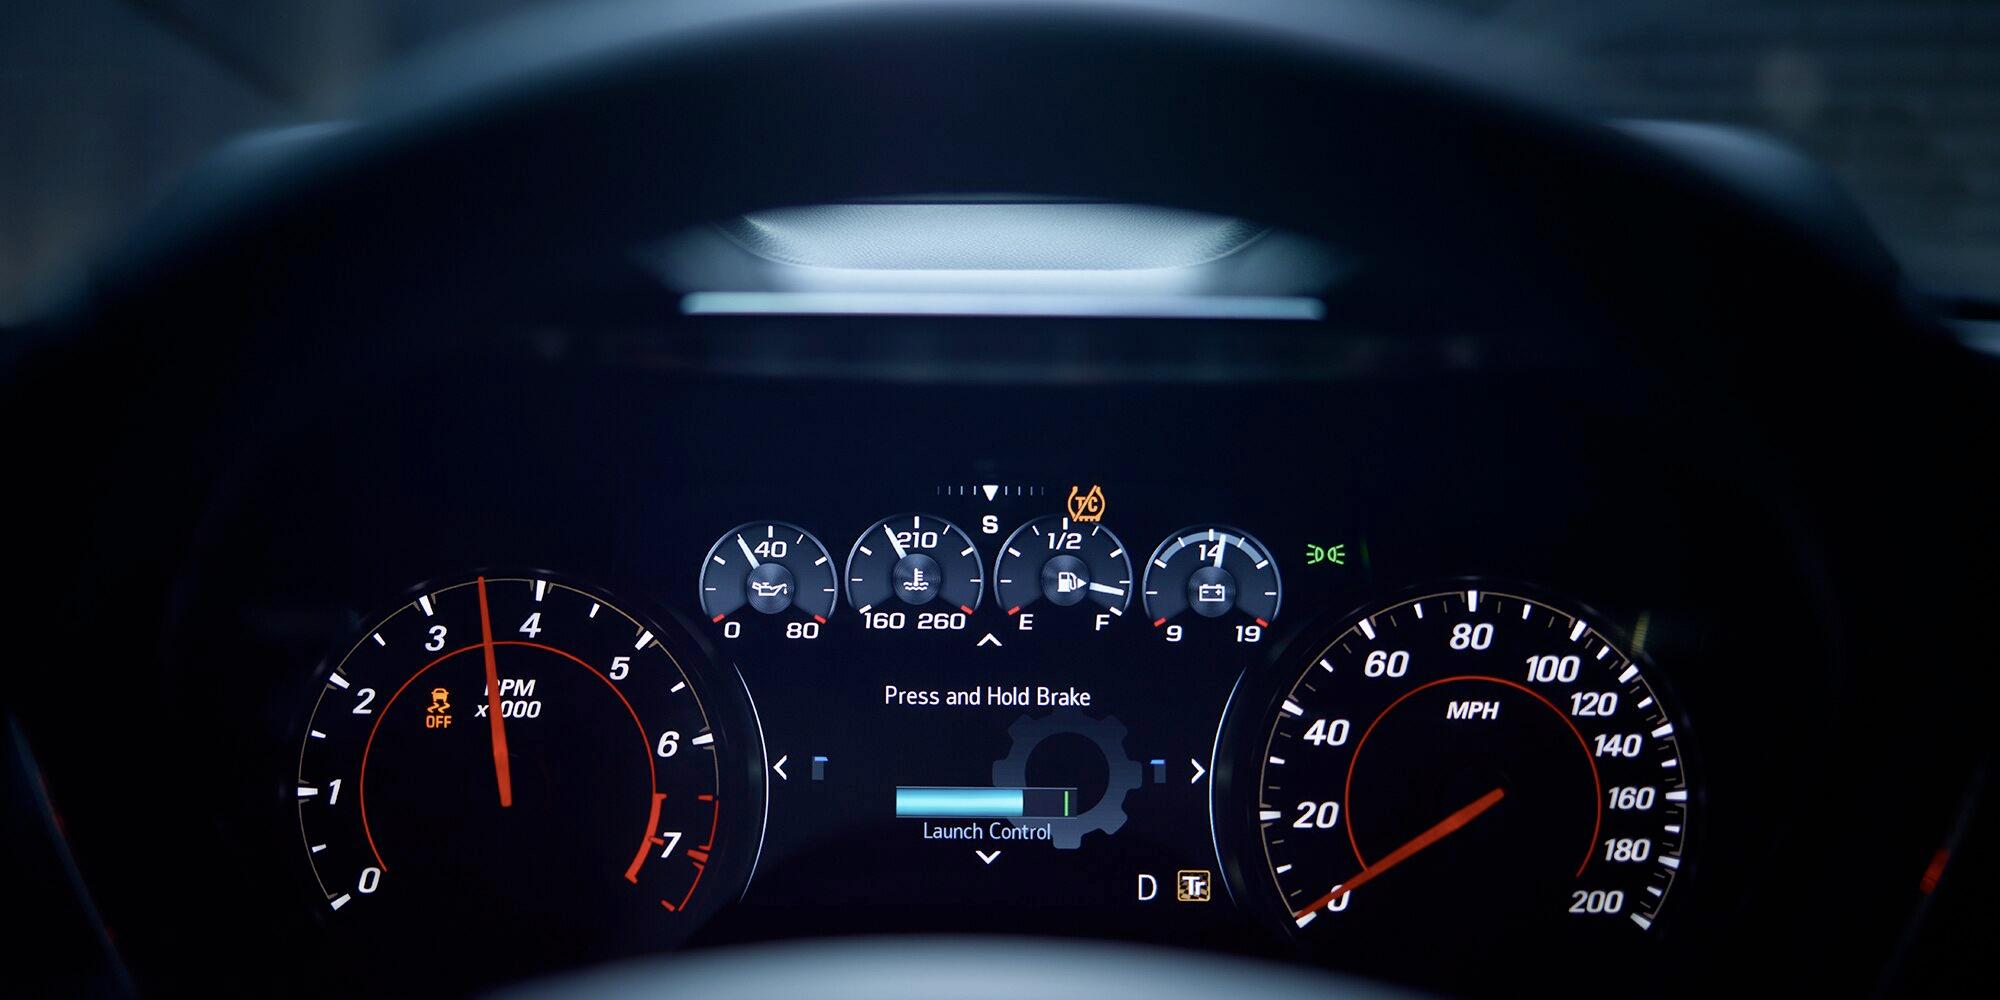 2019 Chevrolet Camaro Technology